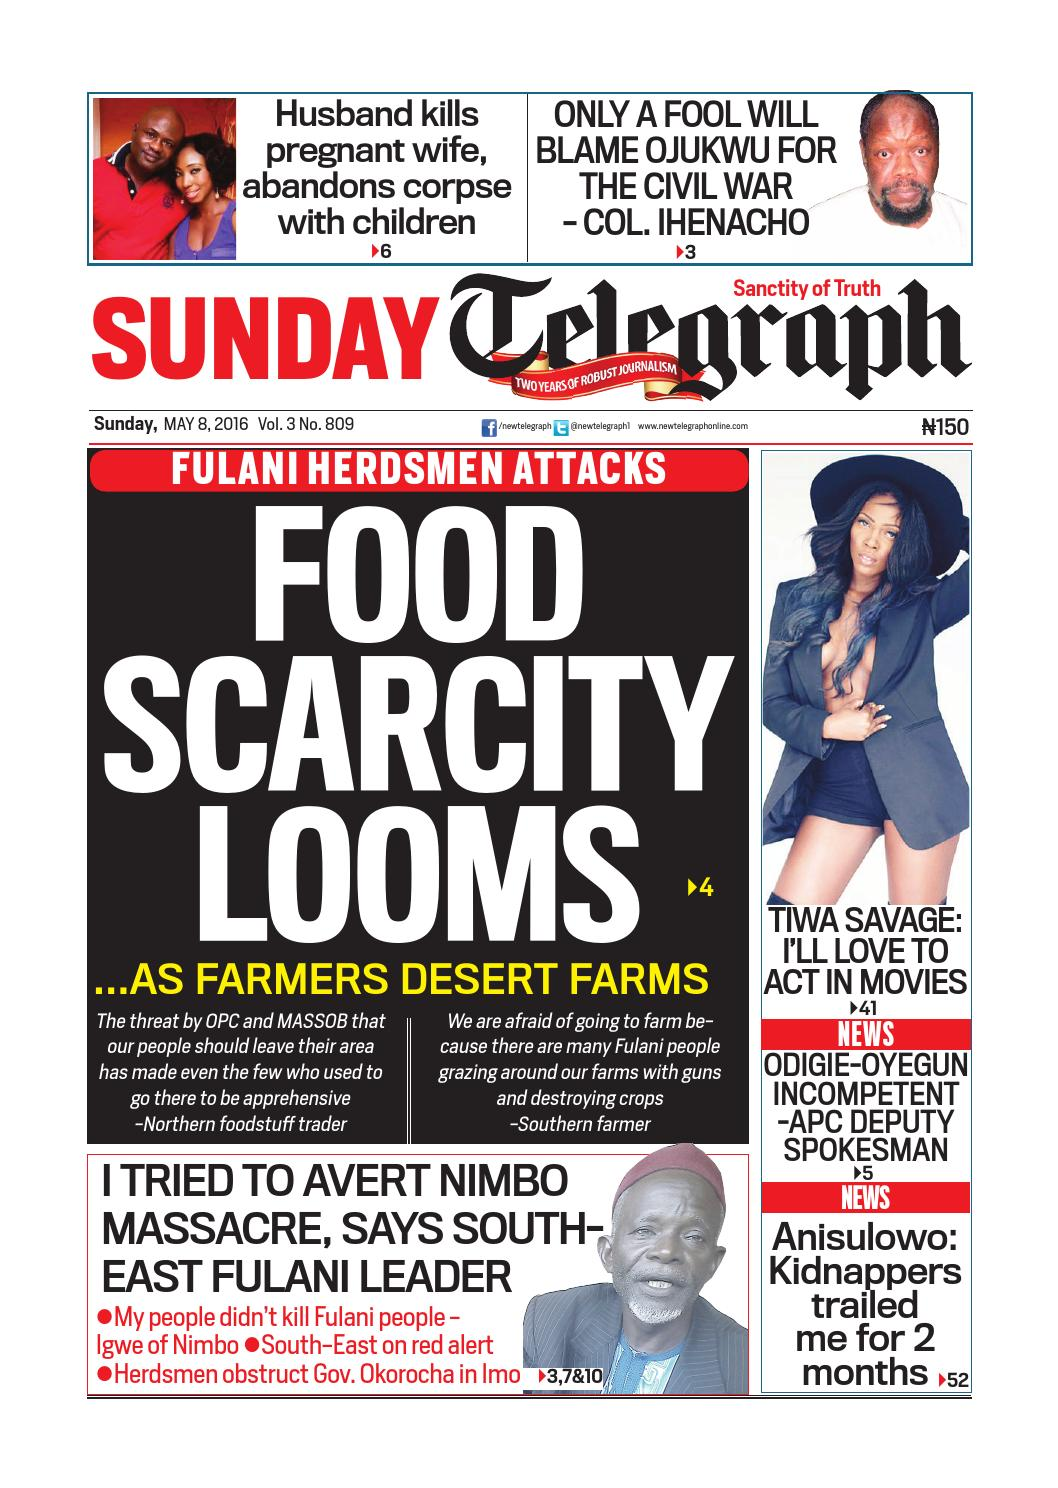 Sunday telegraph sunday, 8 may 2016